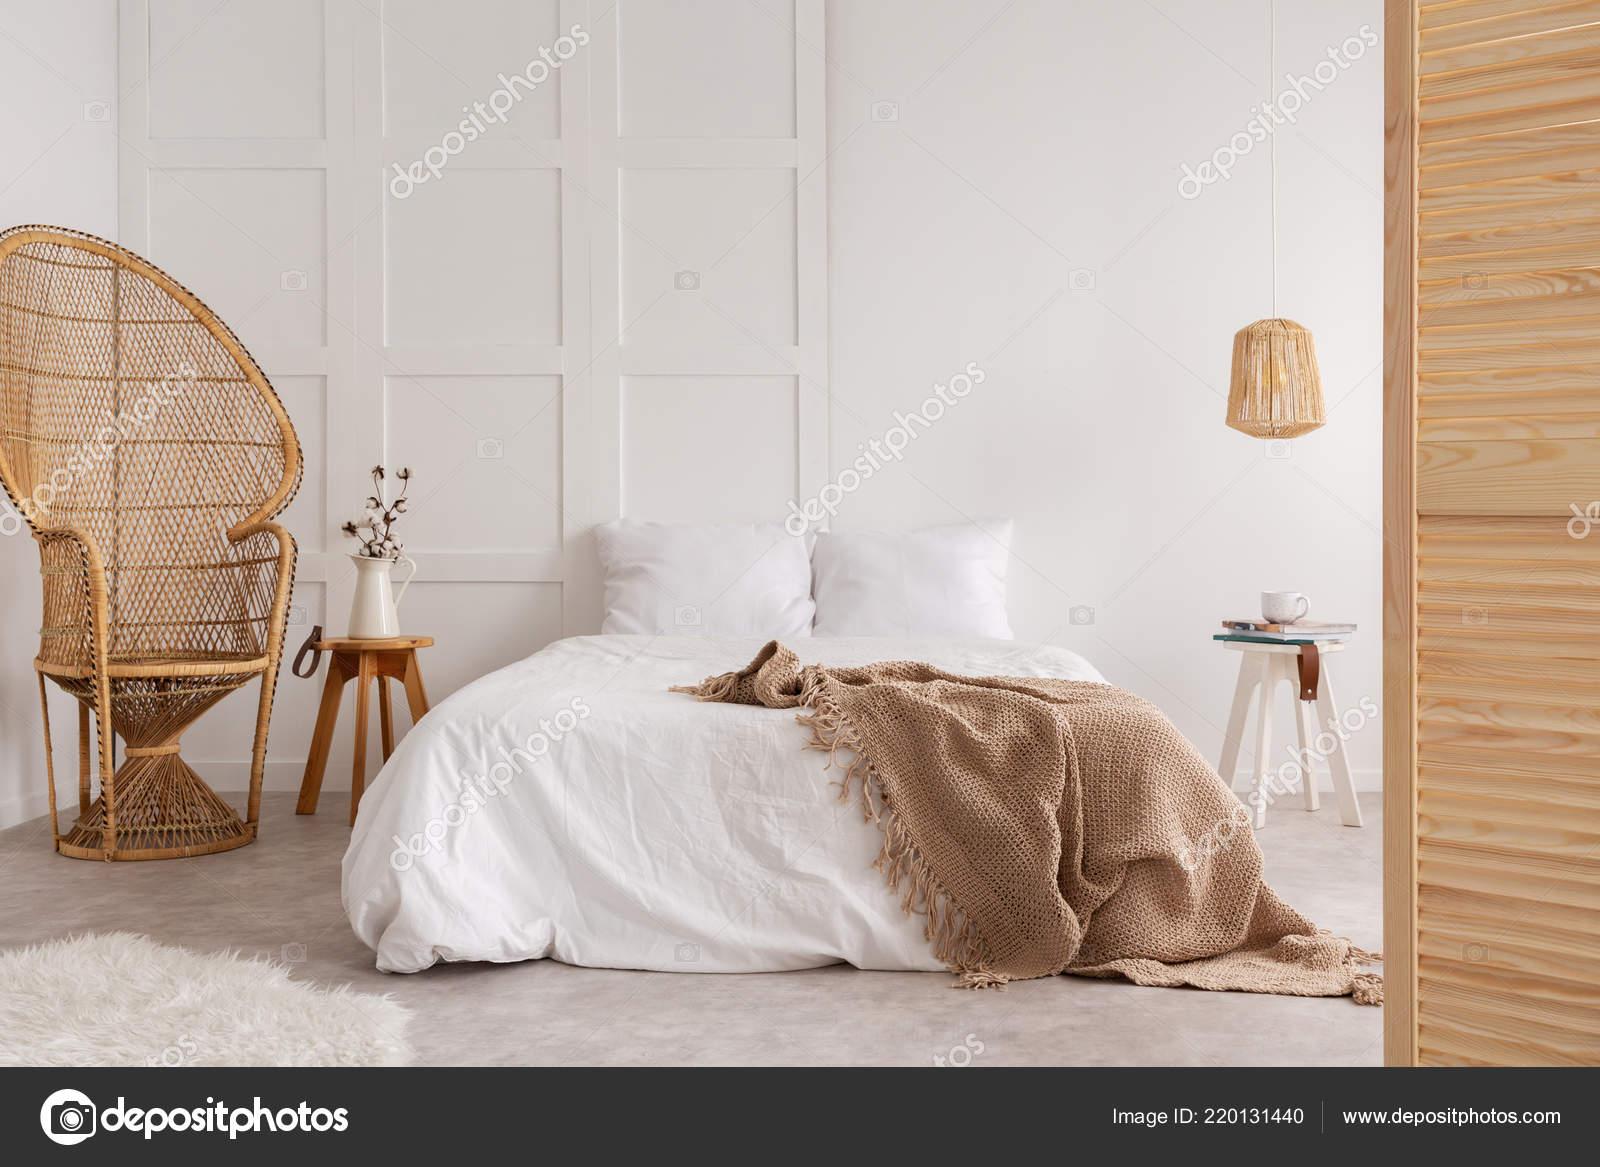 Stoel Rotan Wit : Rotan stoel houten tafel naast bed met bruine deken wit